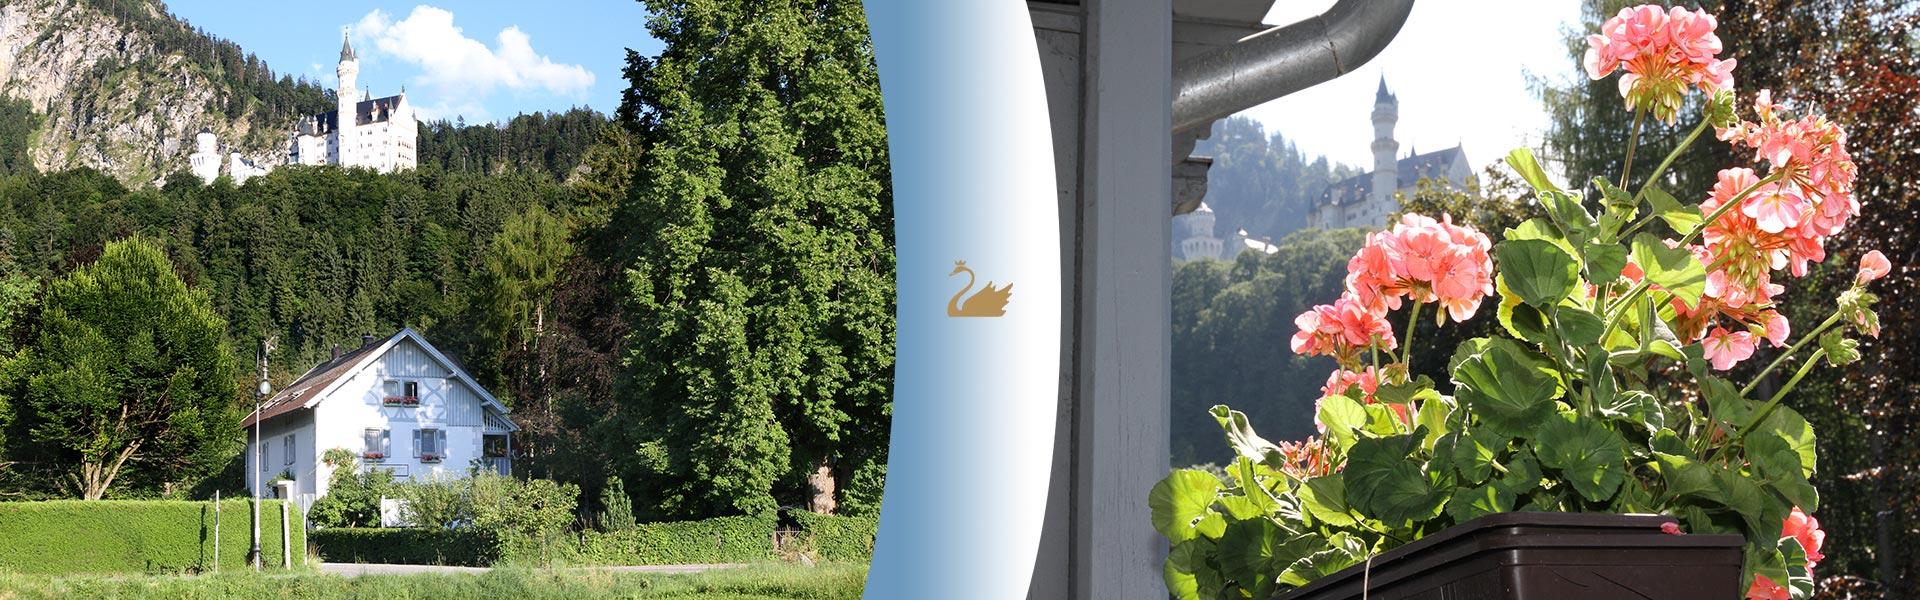 Rooms of the Romantic Pension Albrecht Neuschwanstein